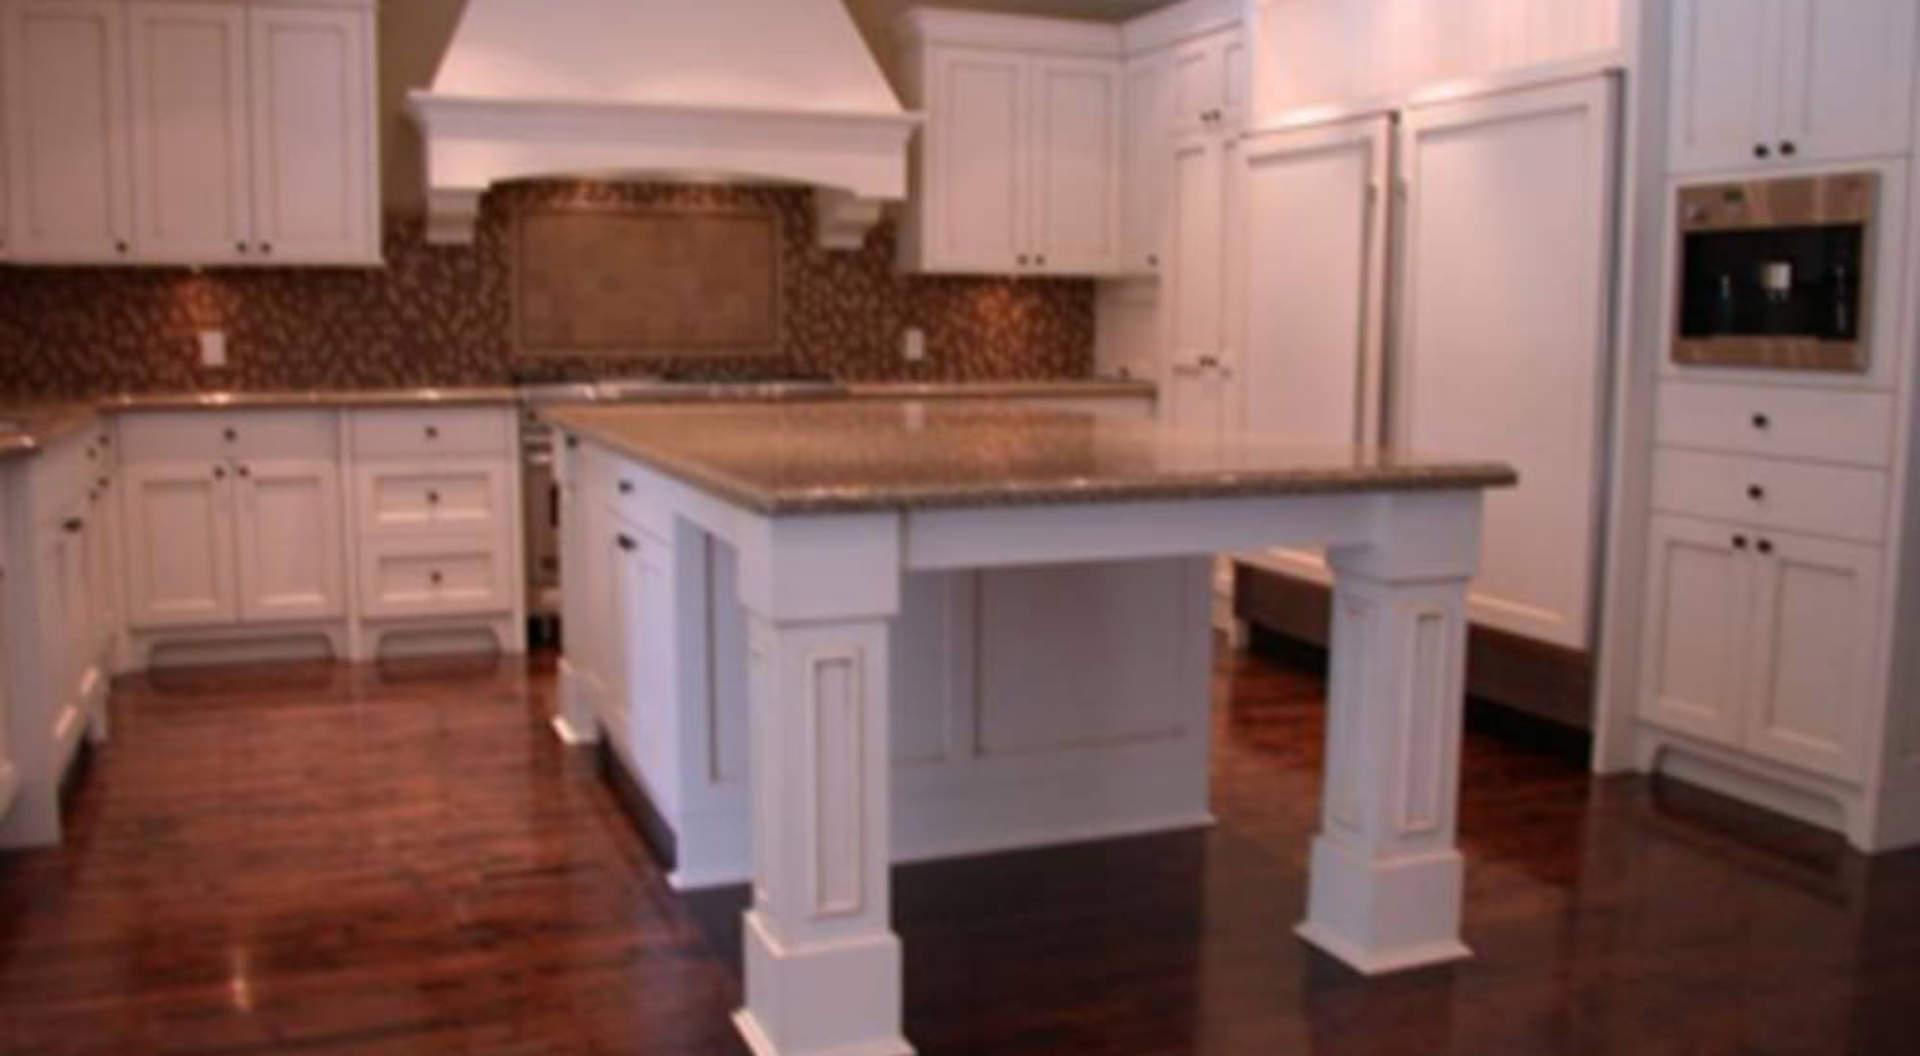 Kitchen islands vancouver 28 images kitchen islands for Kitchen cabinets vancouver island